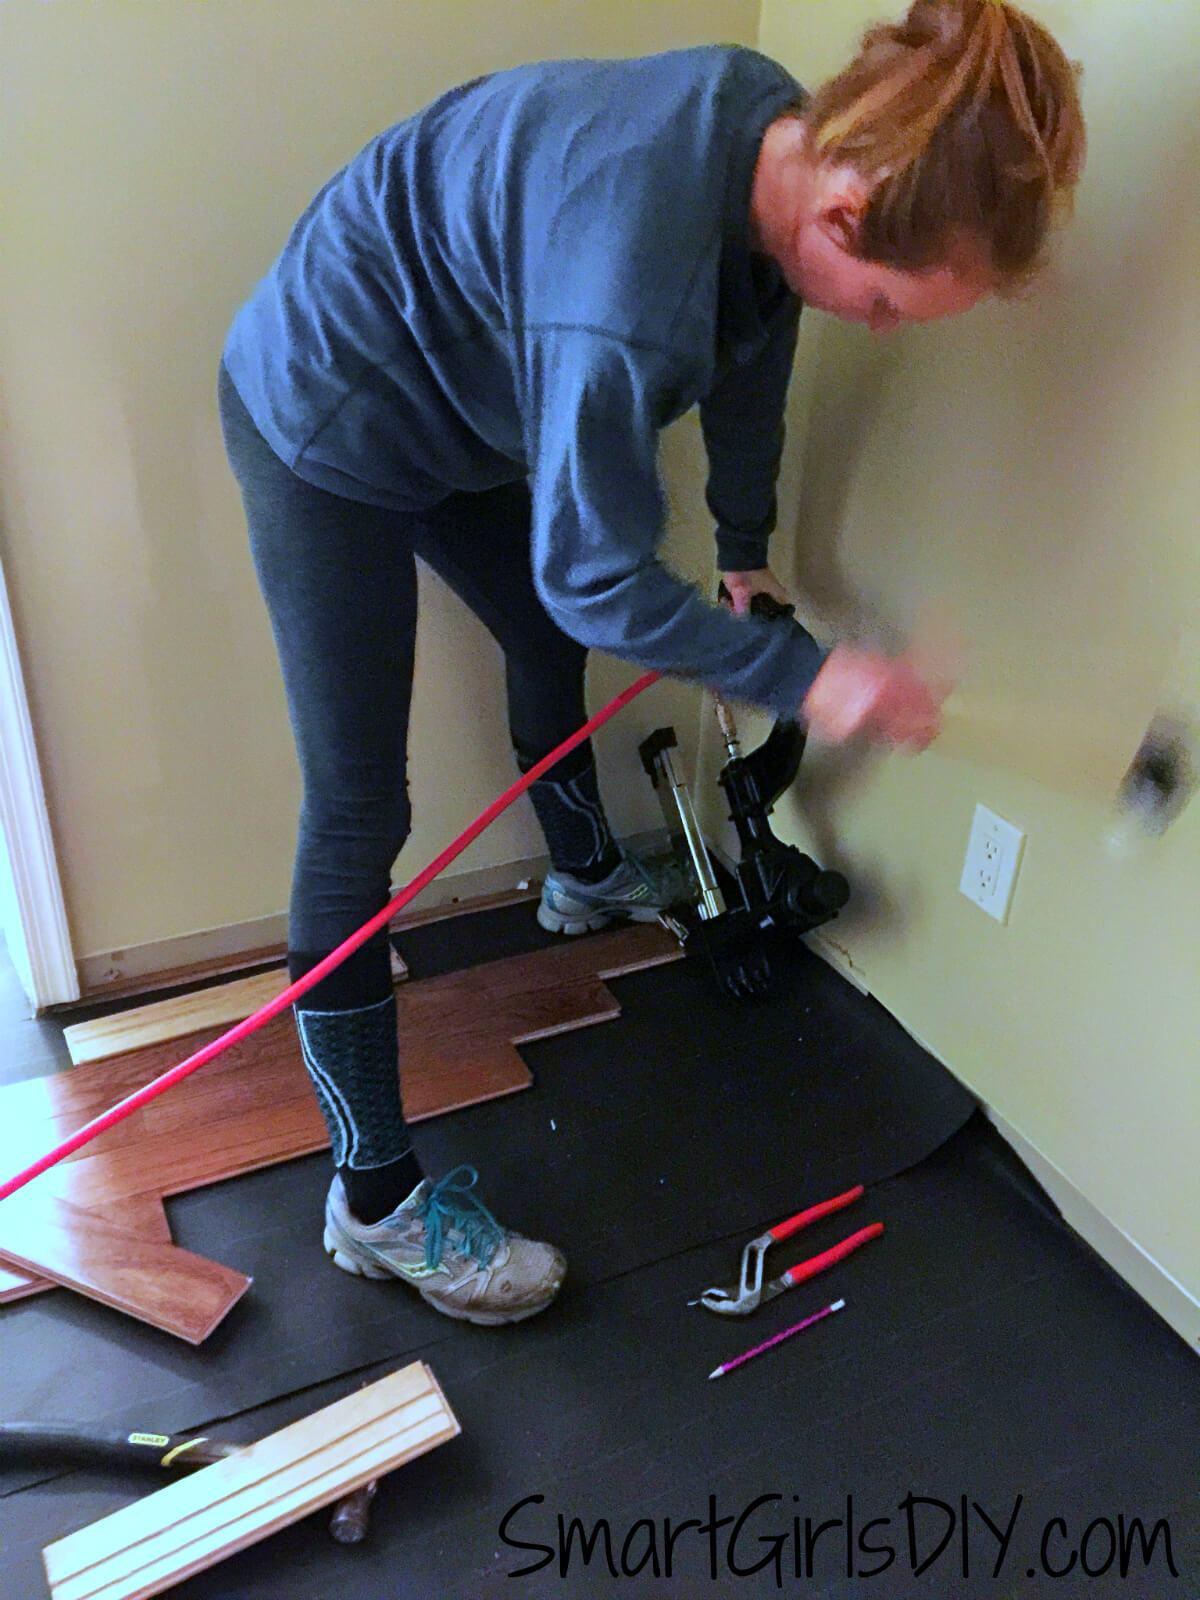 best vacuums for hardwood floors 2016 of upstairs hallway 1 installing hardwood floors pertaining to installing bruce hardwood floor diy